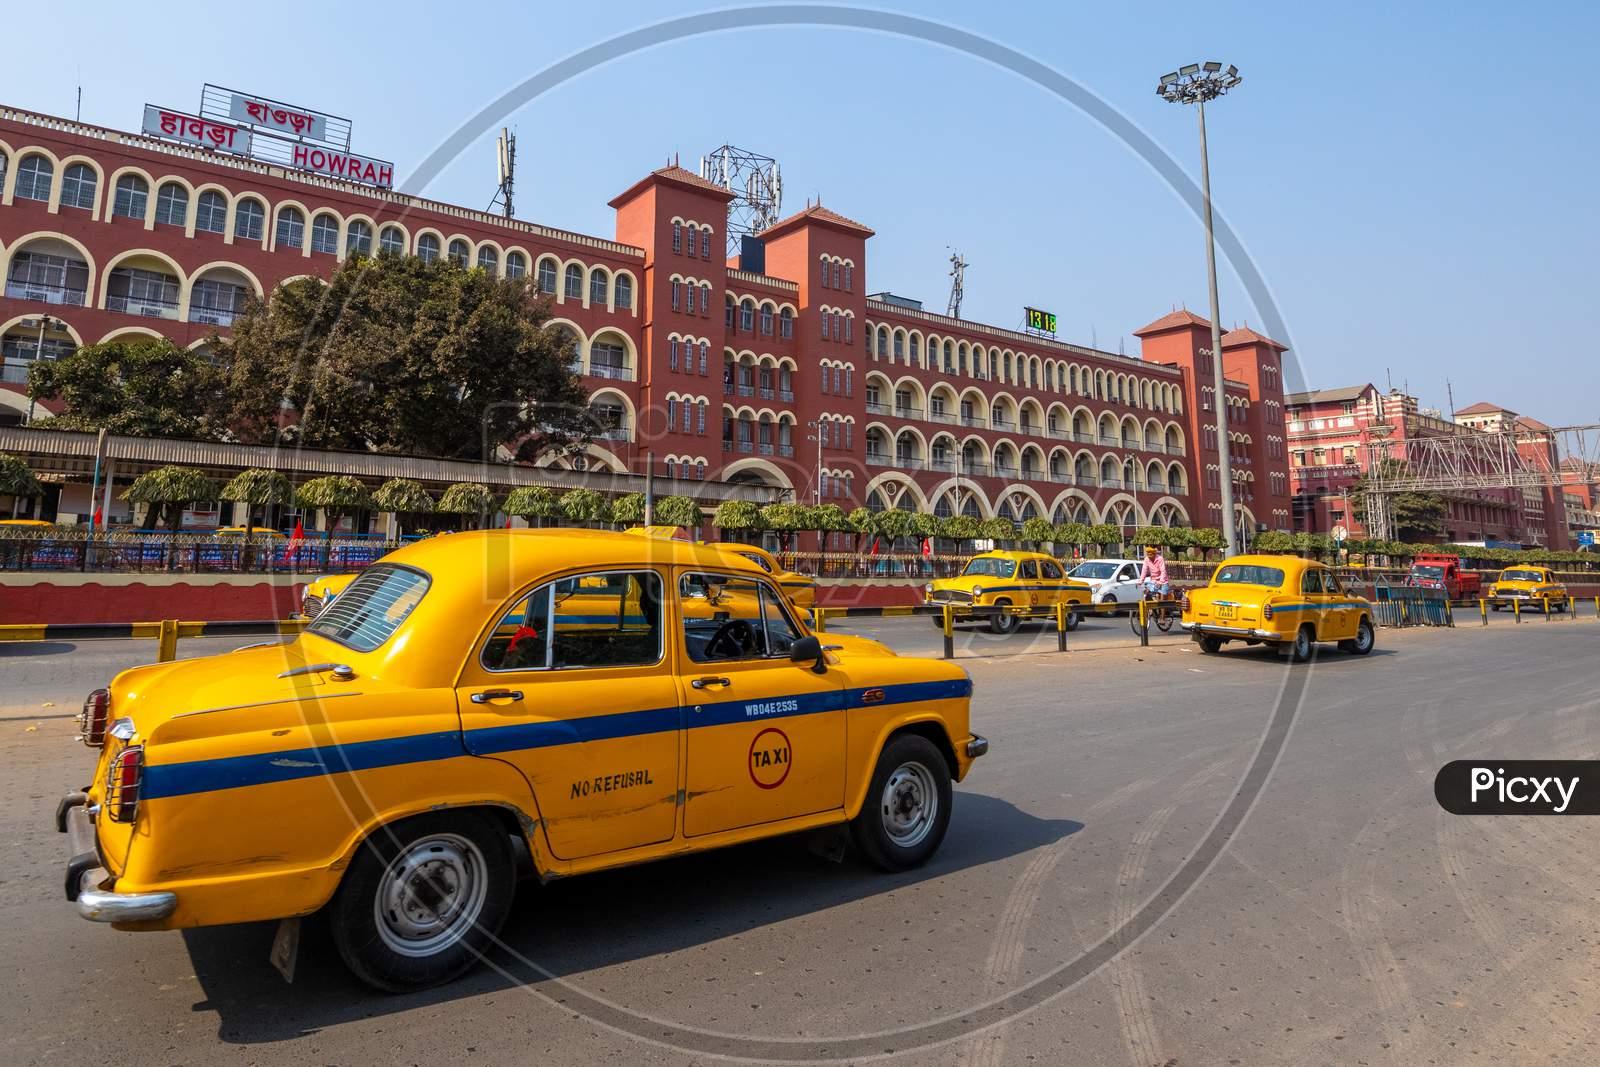 Yellow  Cab  Running On Howrah Railway Station  Background In Kolkata, West Bengal